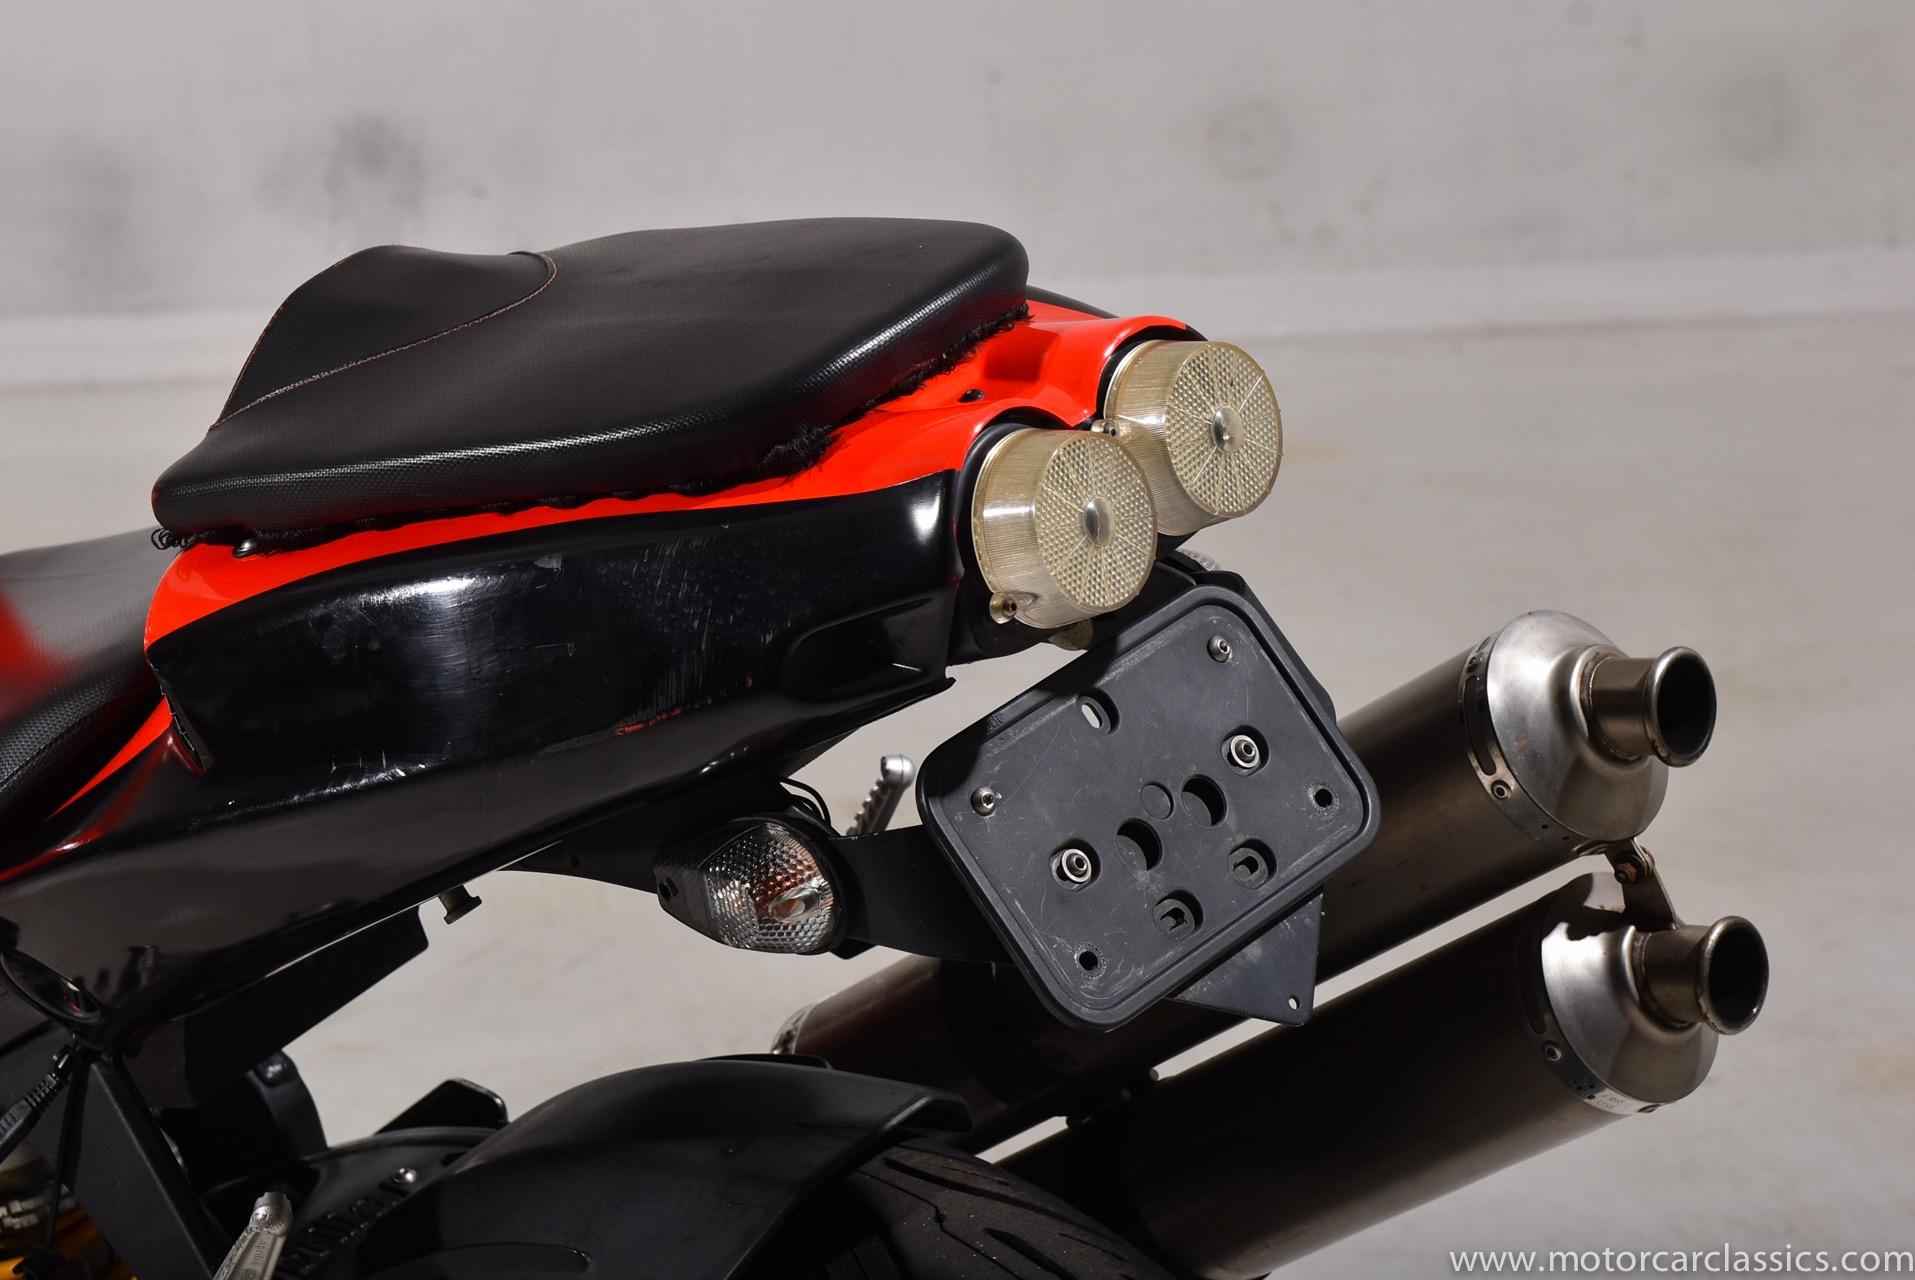 2004 Aprilia RSV1000